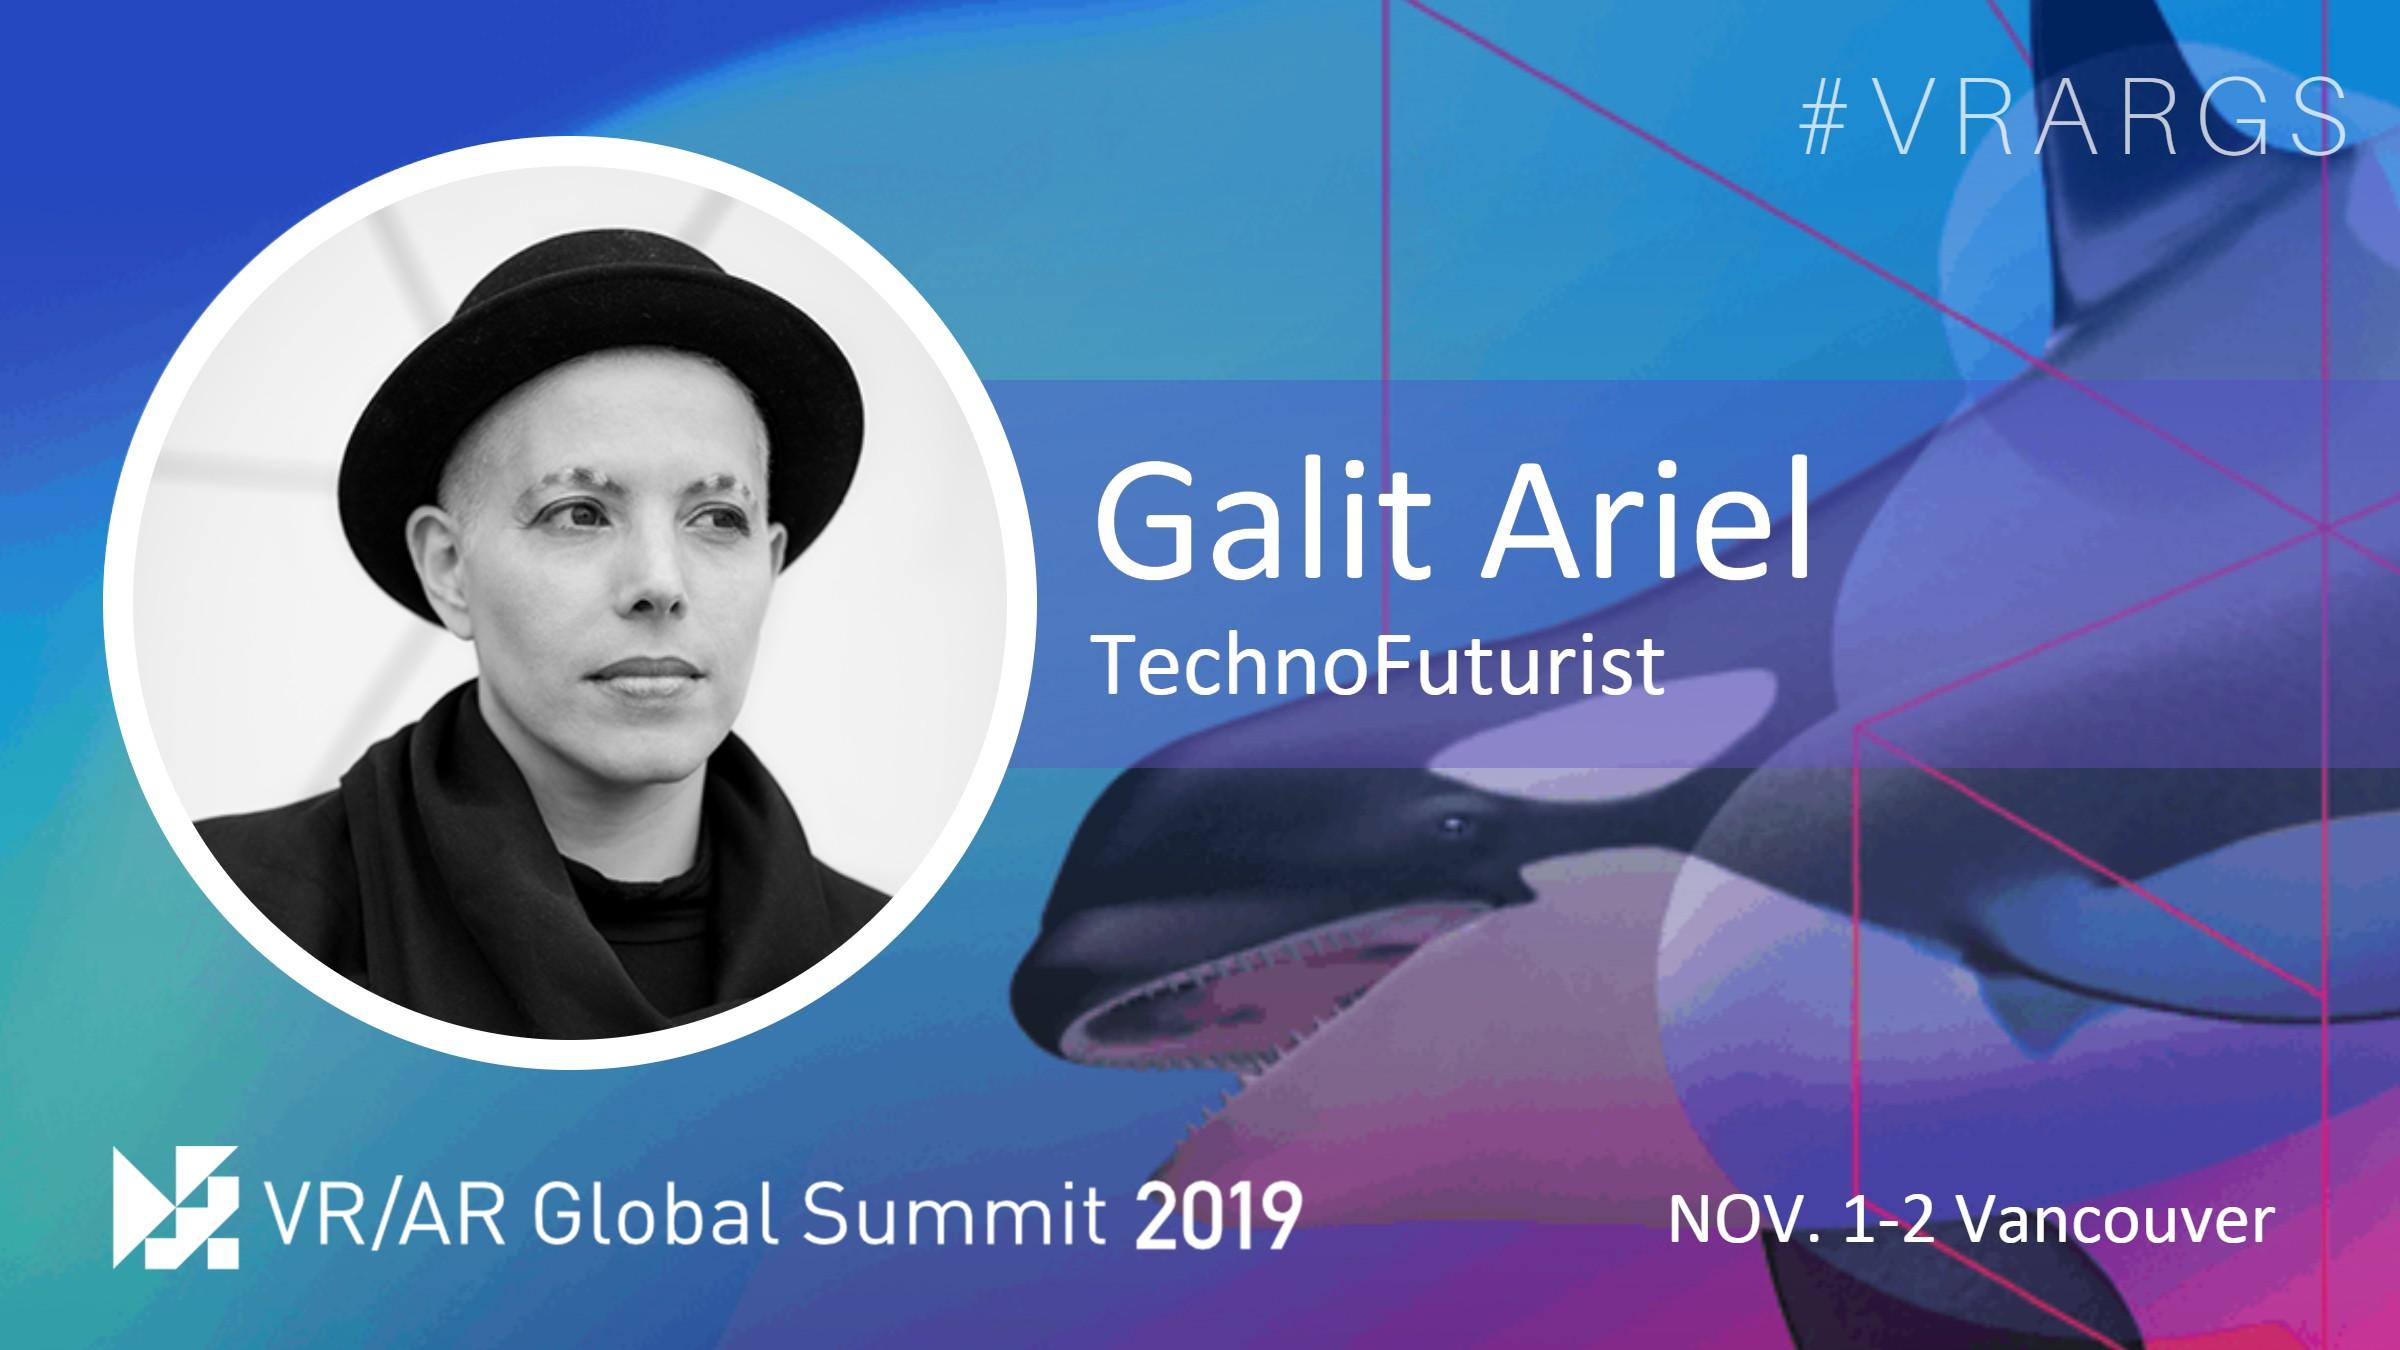 HighRes-Galit-Ariel-TechnoFuturist-VRARGS-VRAR-Global-Summit-Spatial-Computing-Vancouver.jpg